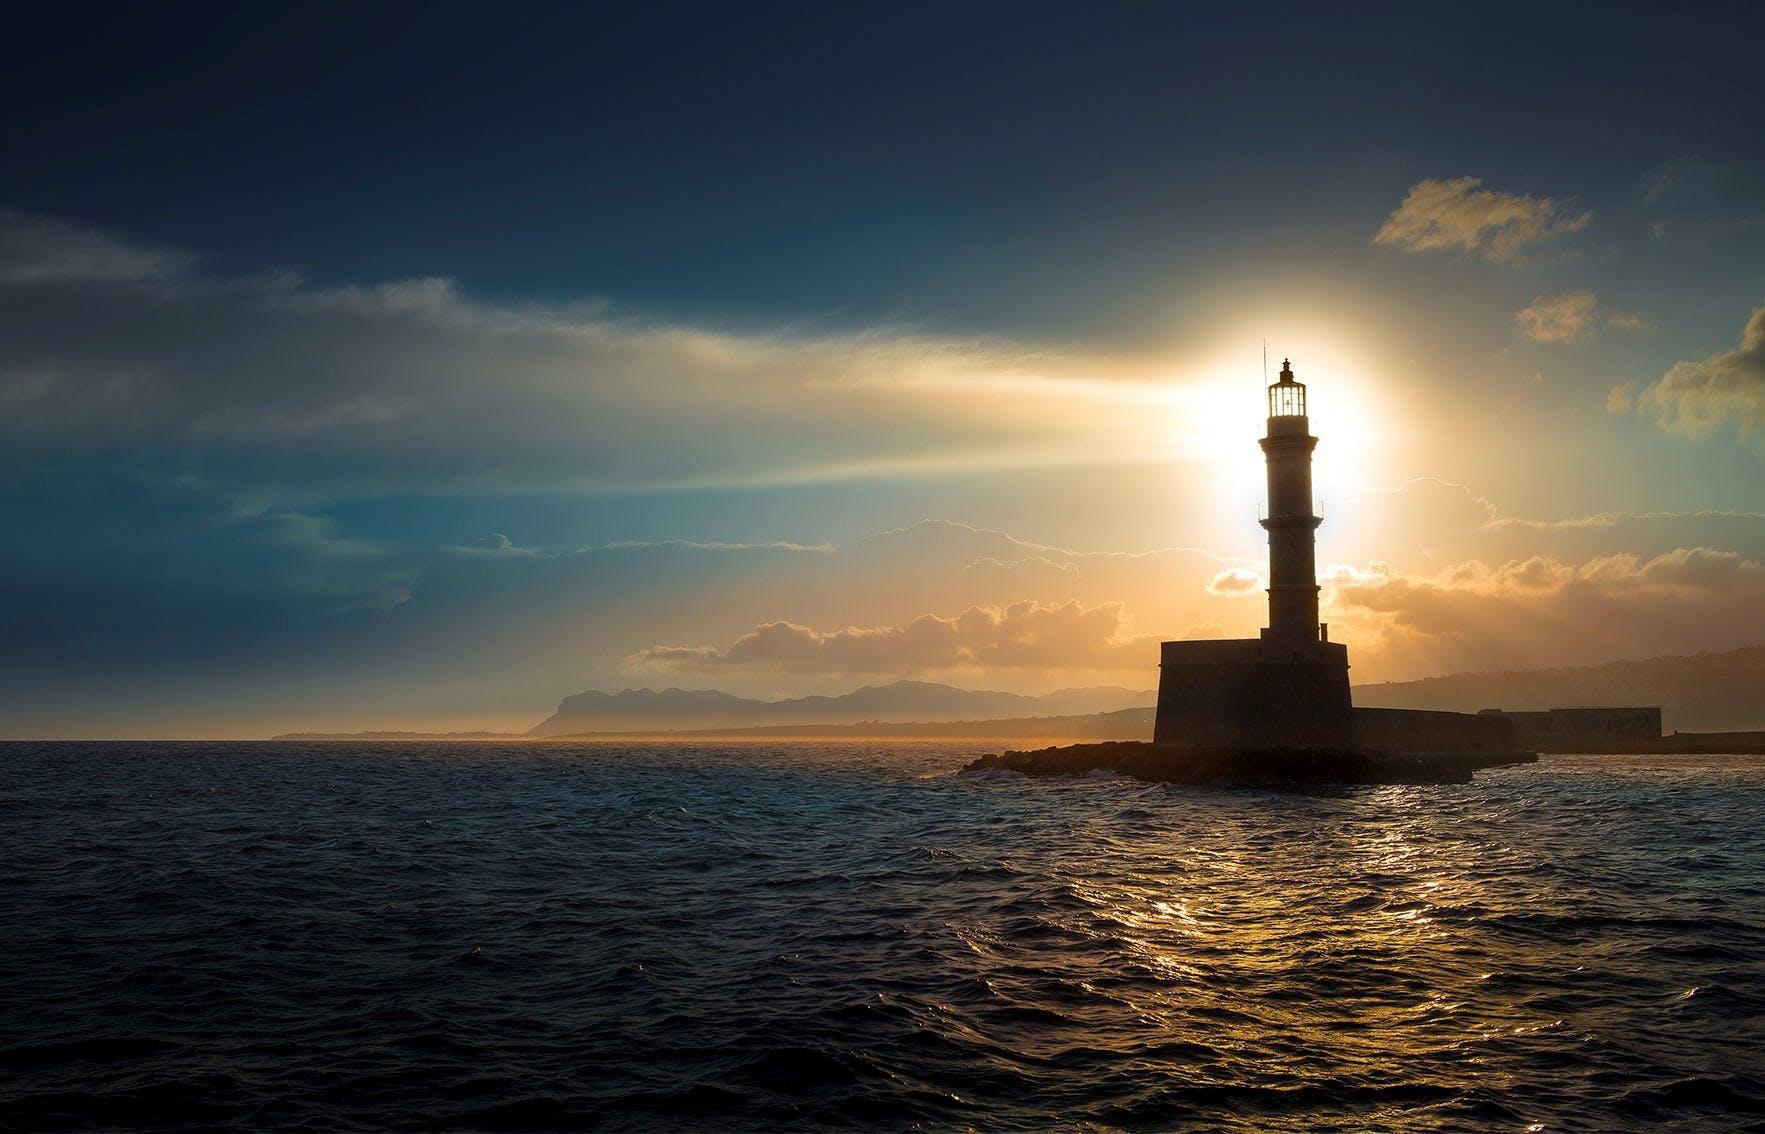 Navigating safely through compliance concerns regarding 2020